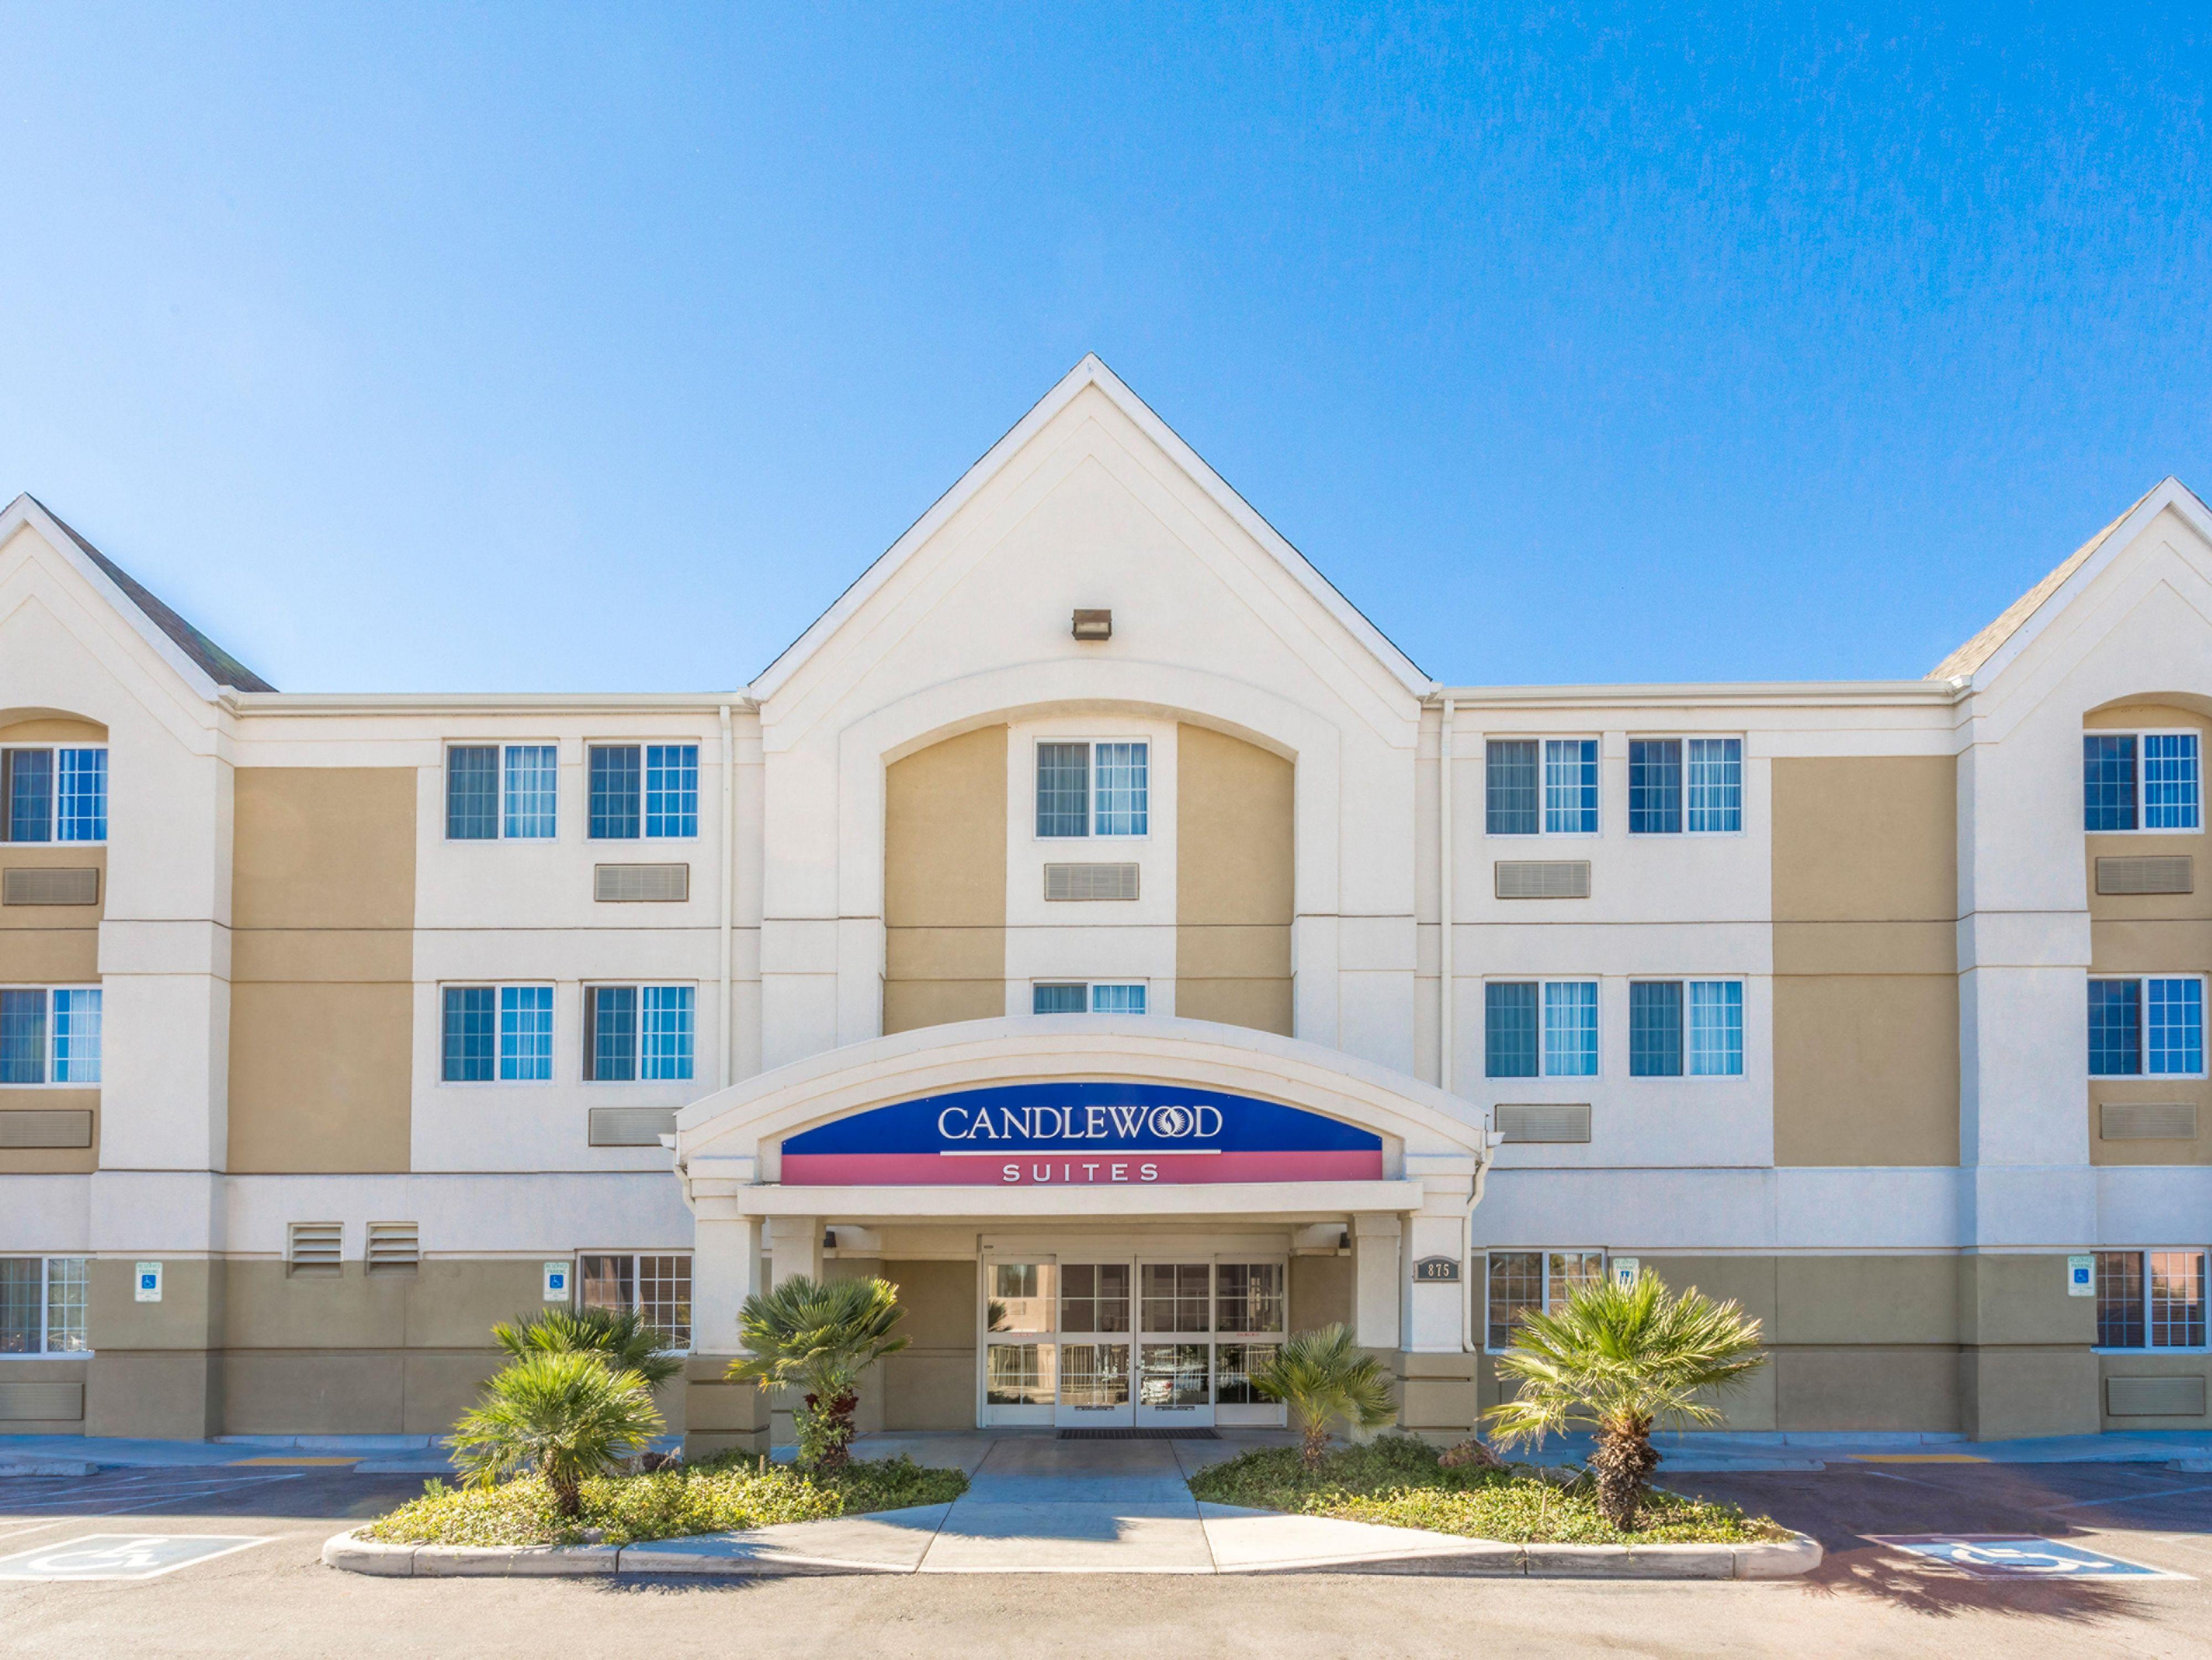 inn green uga az hotels comfort comforter comfortinn valley view turismo poolview